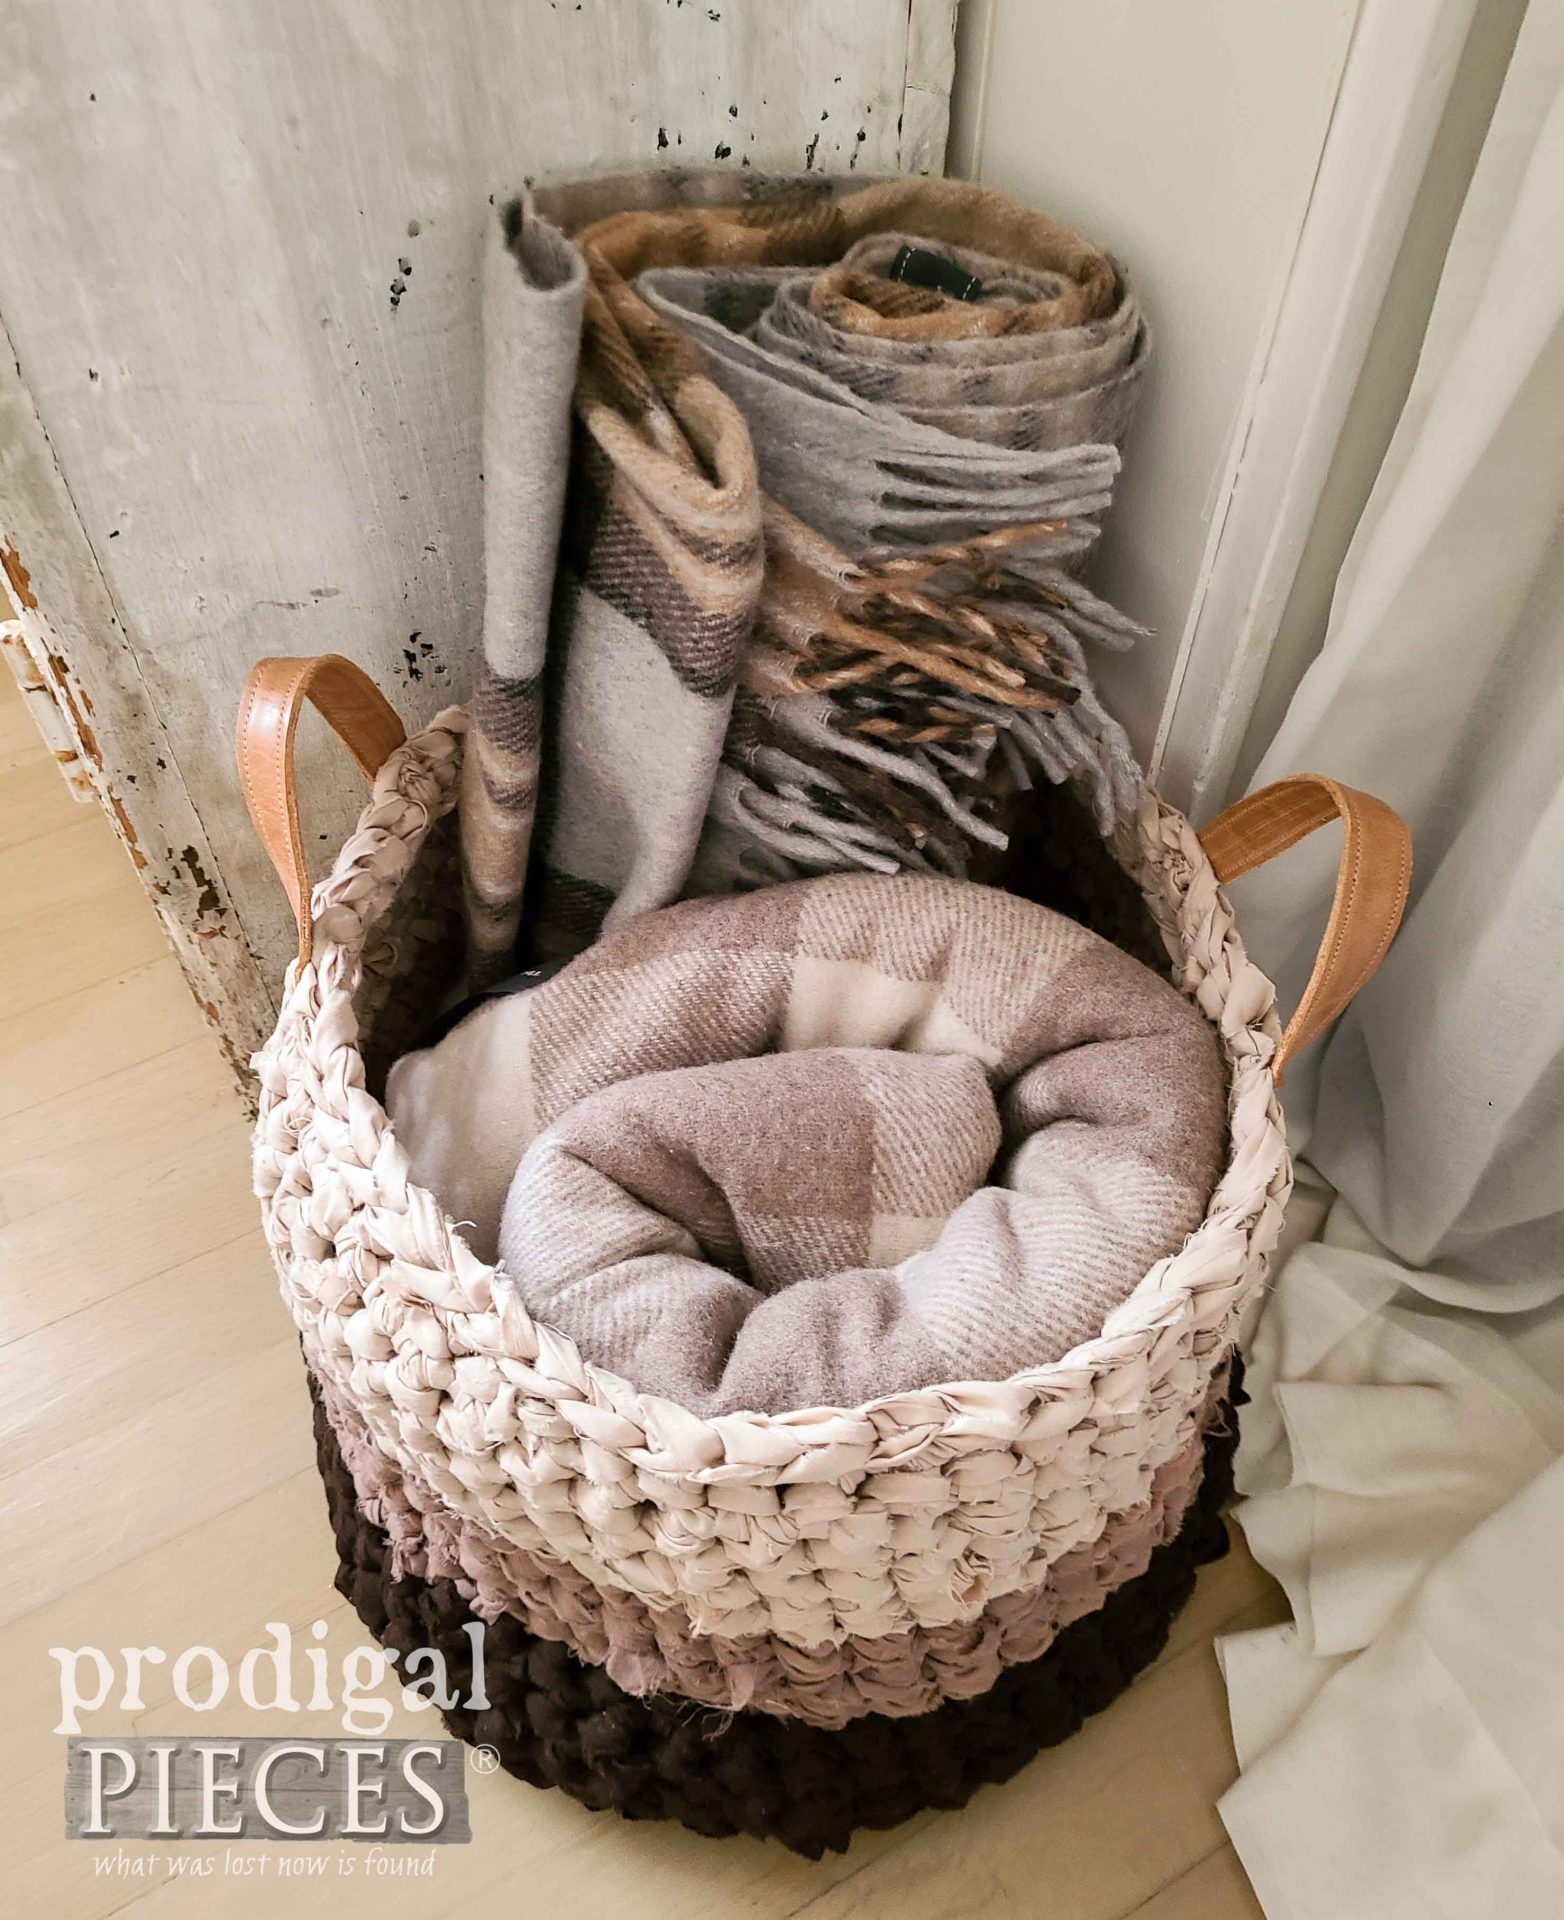 Top view of DIY Crochet Basket by Larissa of Prodigal Pieces | prodigalpieces.com #prodigalpieces #handmade #crochet #crafts